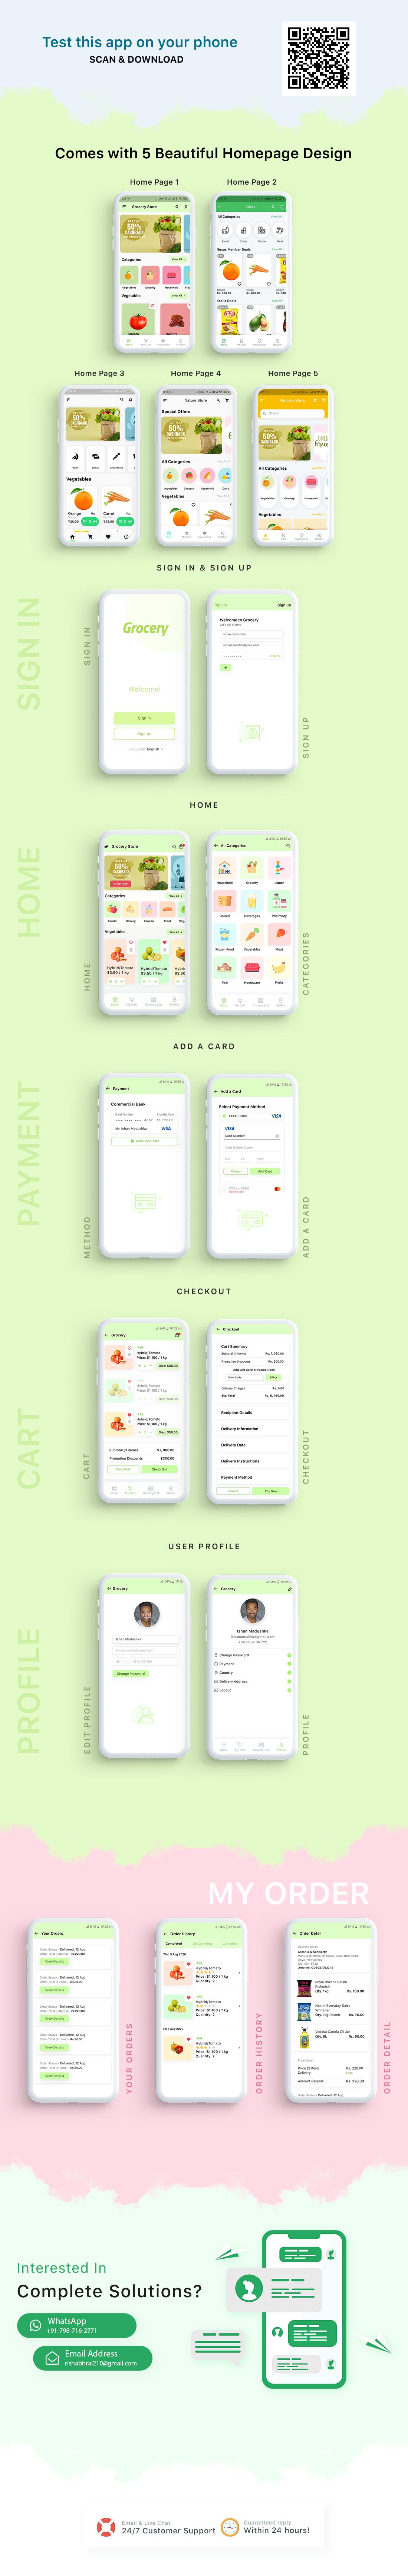 Grocery local Store Mobile Flutter App UI Kit - 1